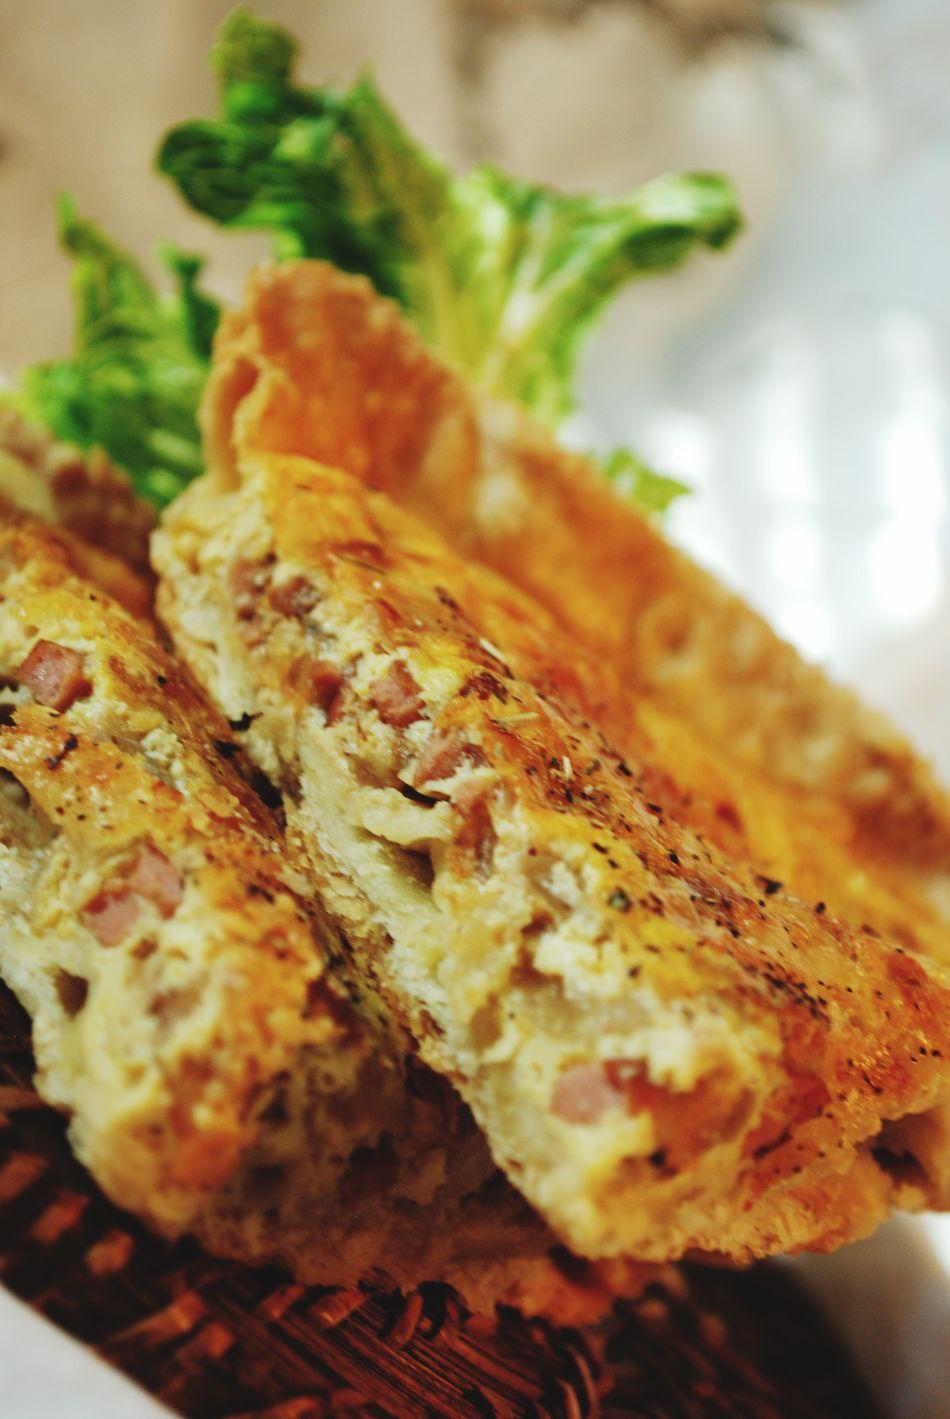 Quiche Lorraine Food Pie My World Of Food Quiche from Minneapolis